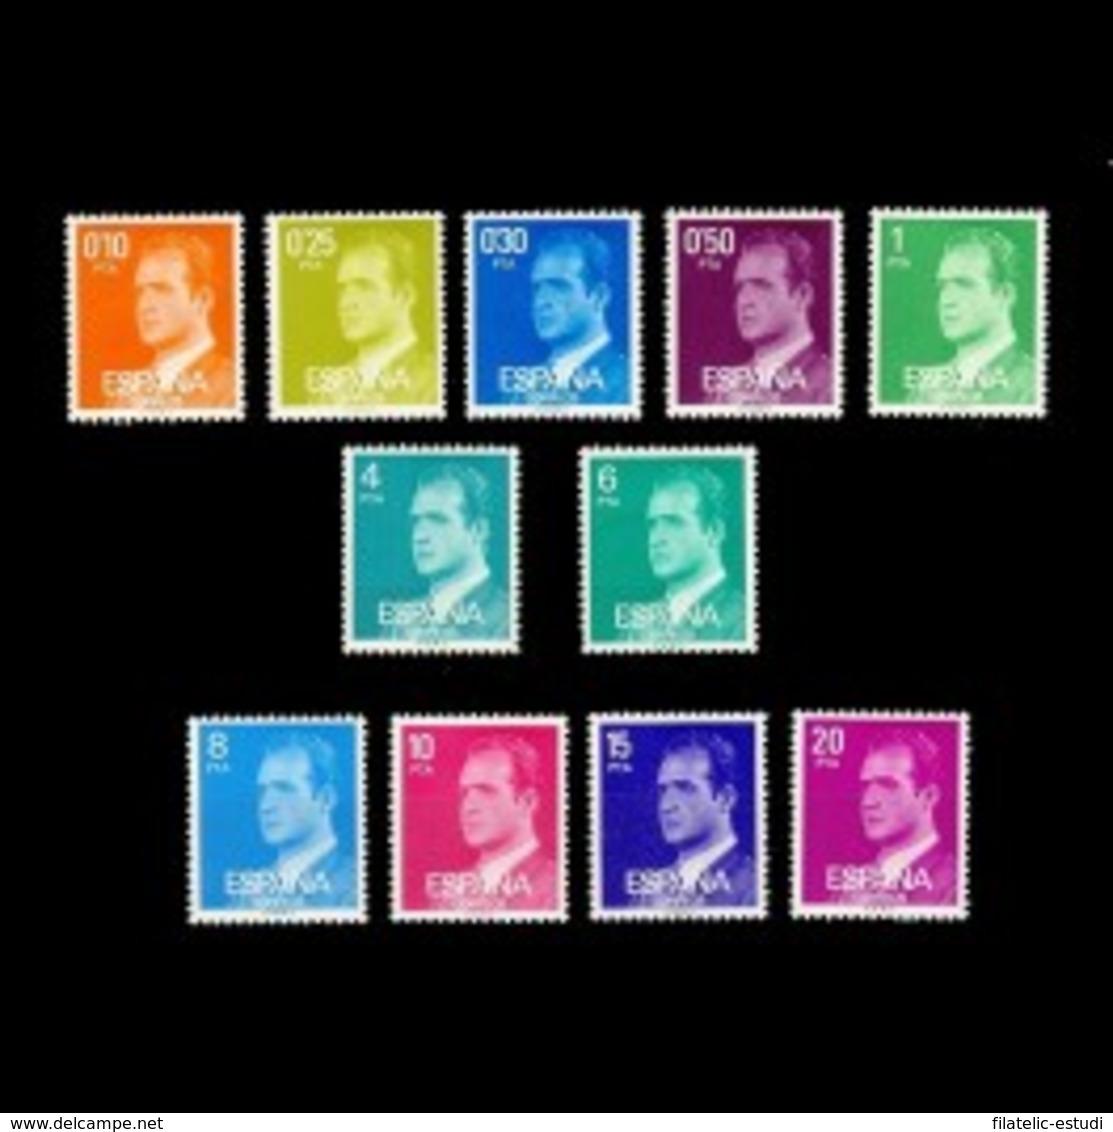 España Spain 2386/96 1977 SM Don Juan Carlos I, Lujo MNH - Spagna